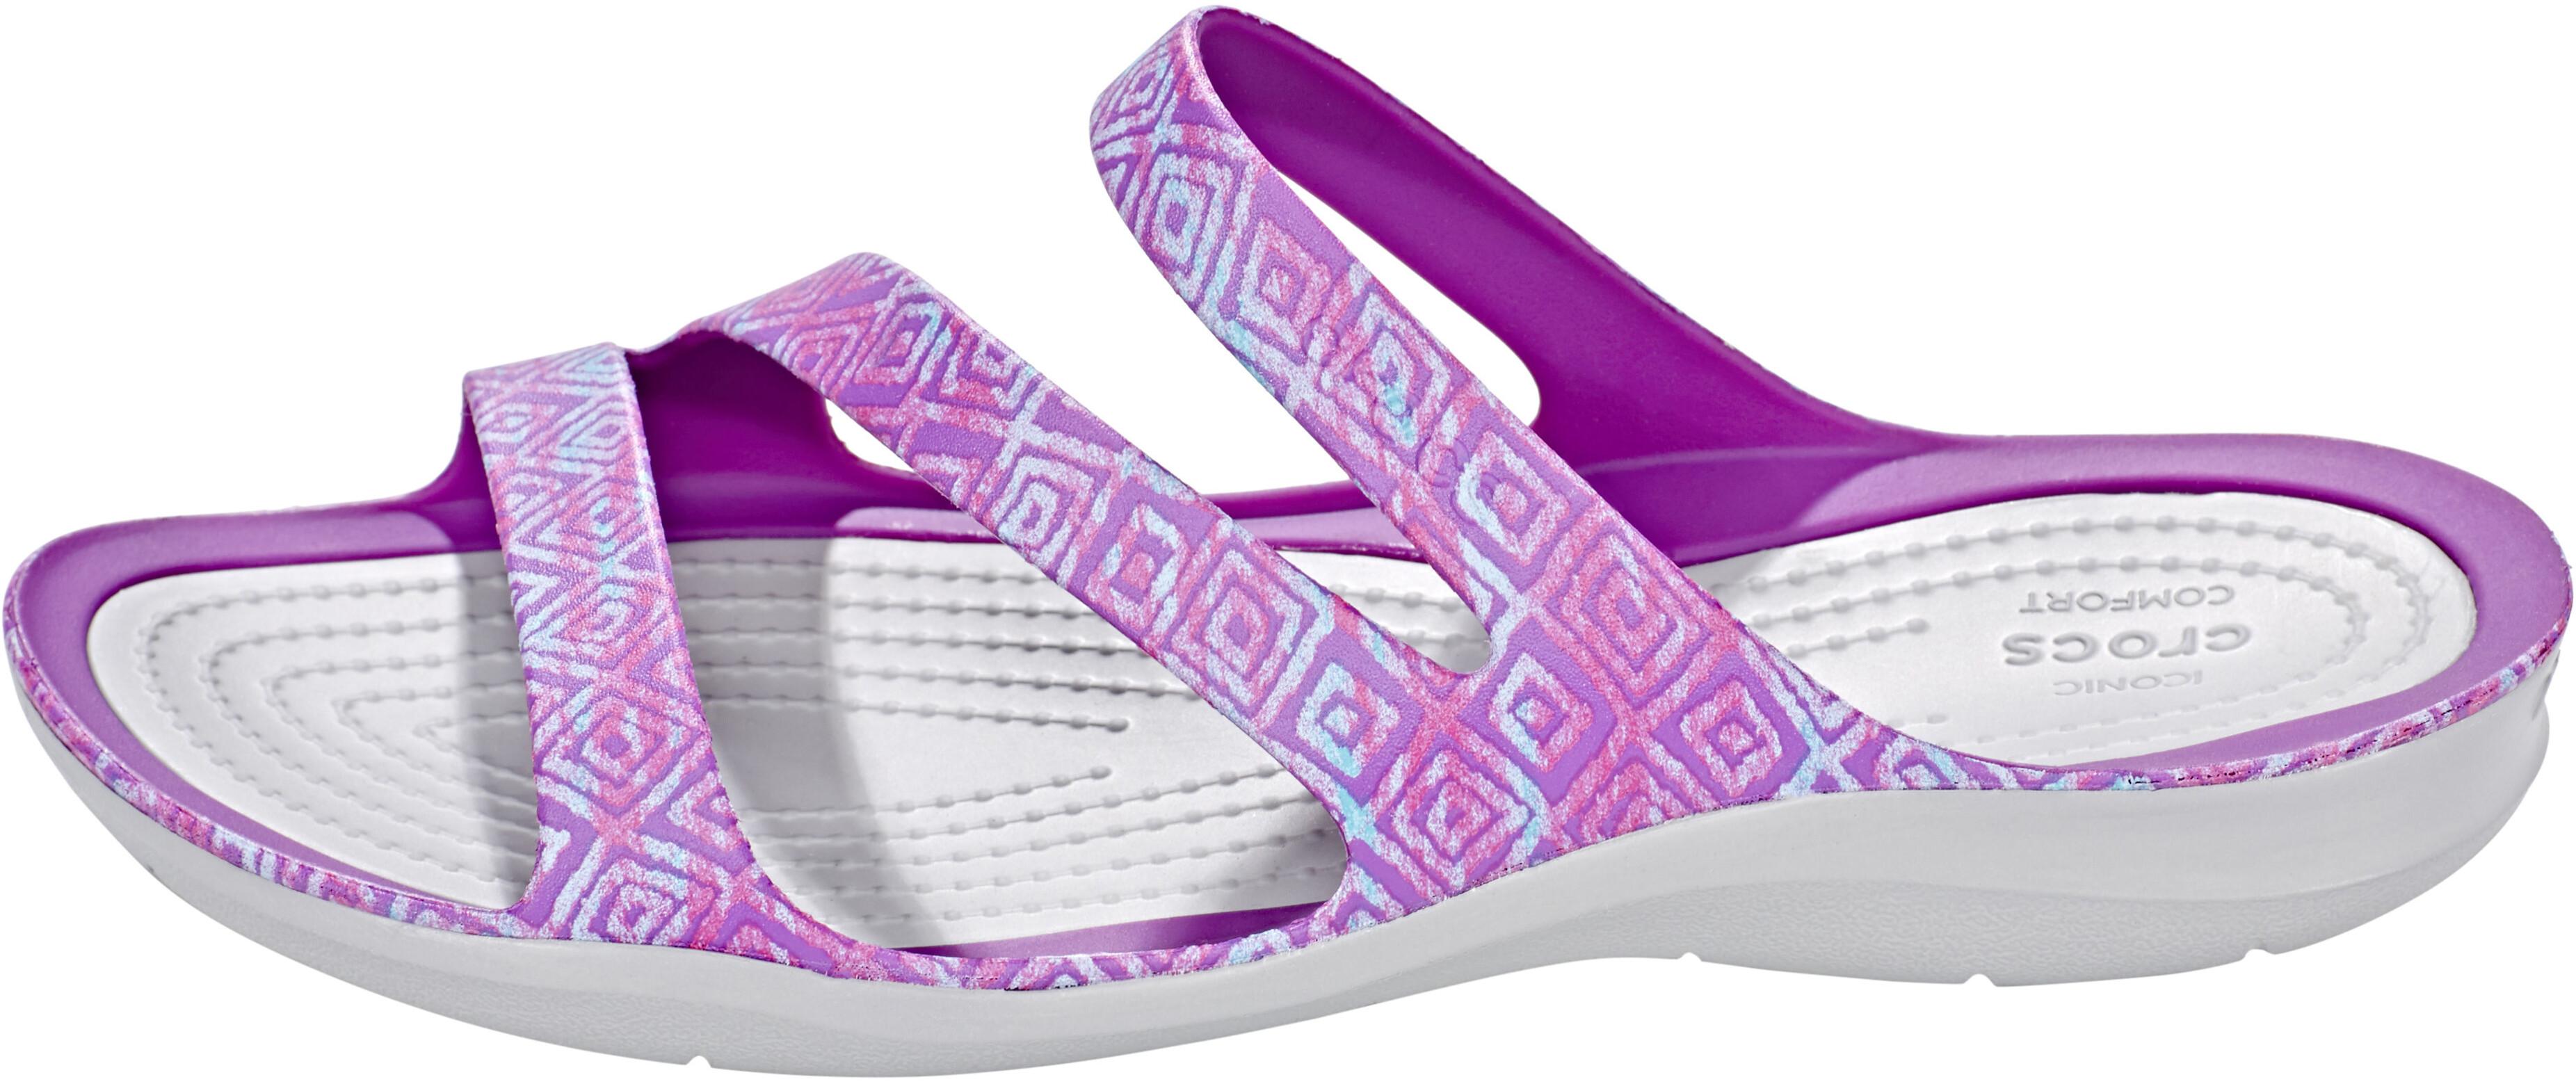 6cb28aa035c9 Crocs Swiftwater Graphic Sandals Women Amethyst Diamond Light Grey ...